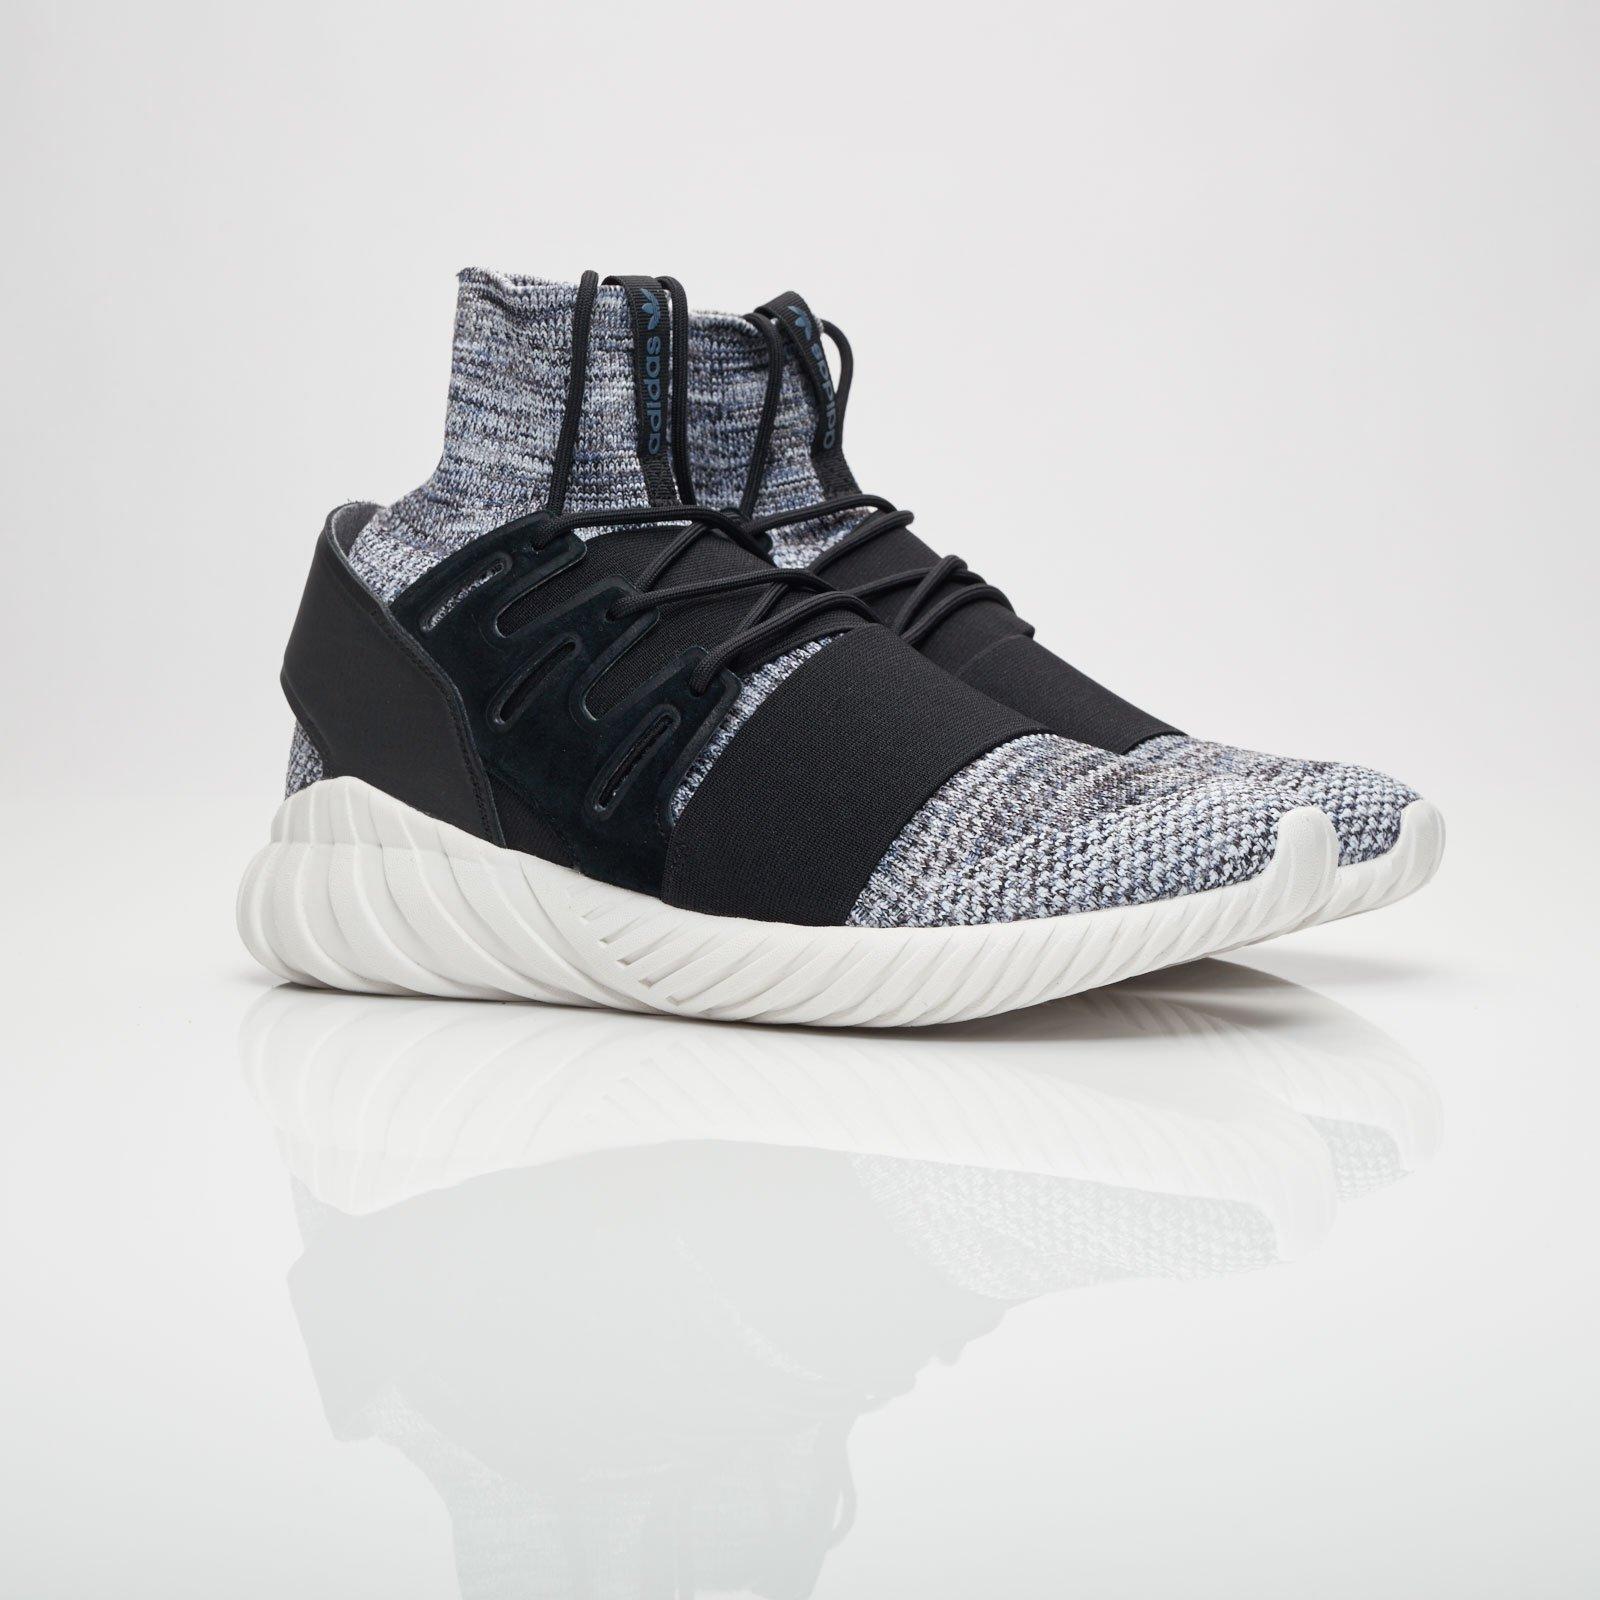 adidas Tubular Doom Pk By3550 Sneakersnstuff | | Sneakersnstuff sneakers 14d5a1